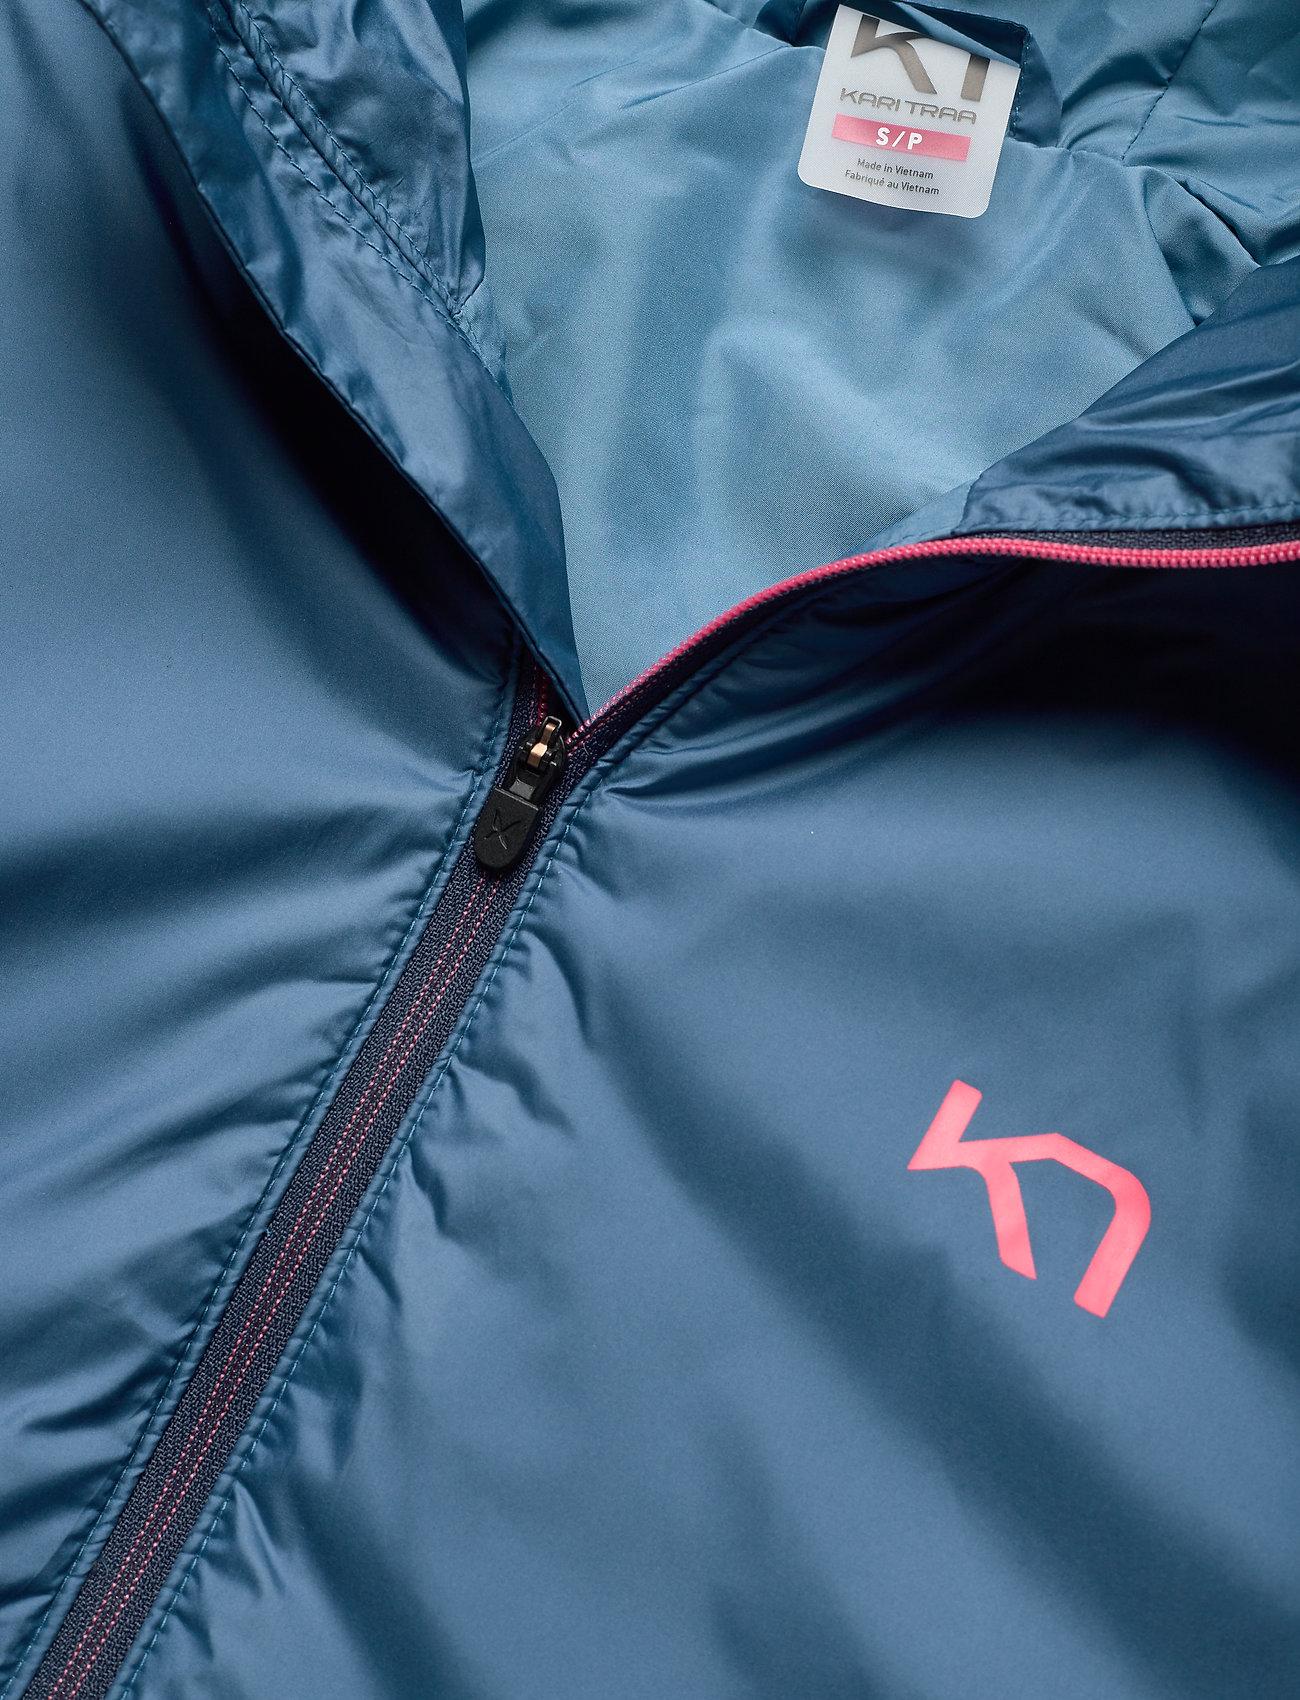 Solveig Jacket (Astro) (689.40 kr) - Kari Traa BkgYKnGc